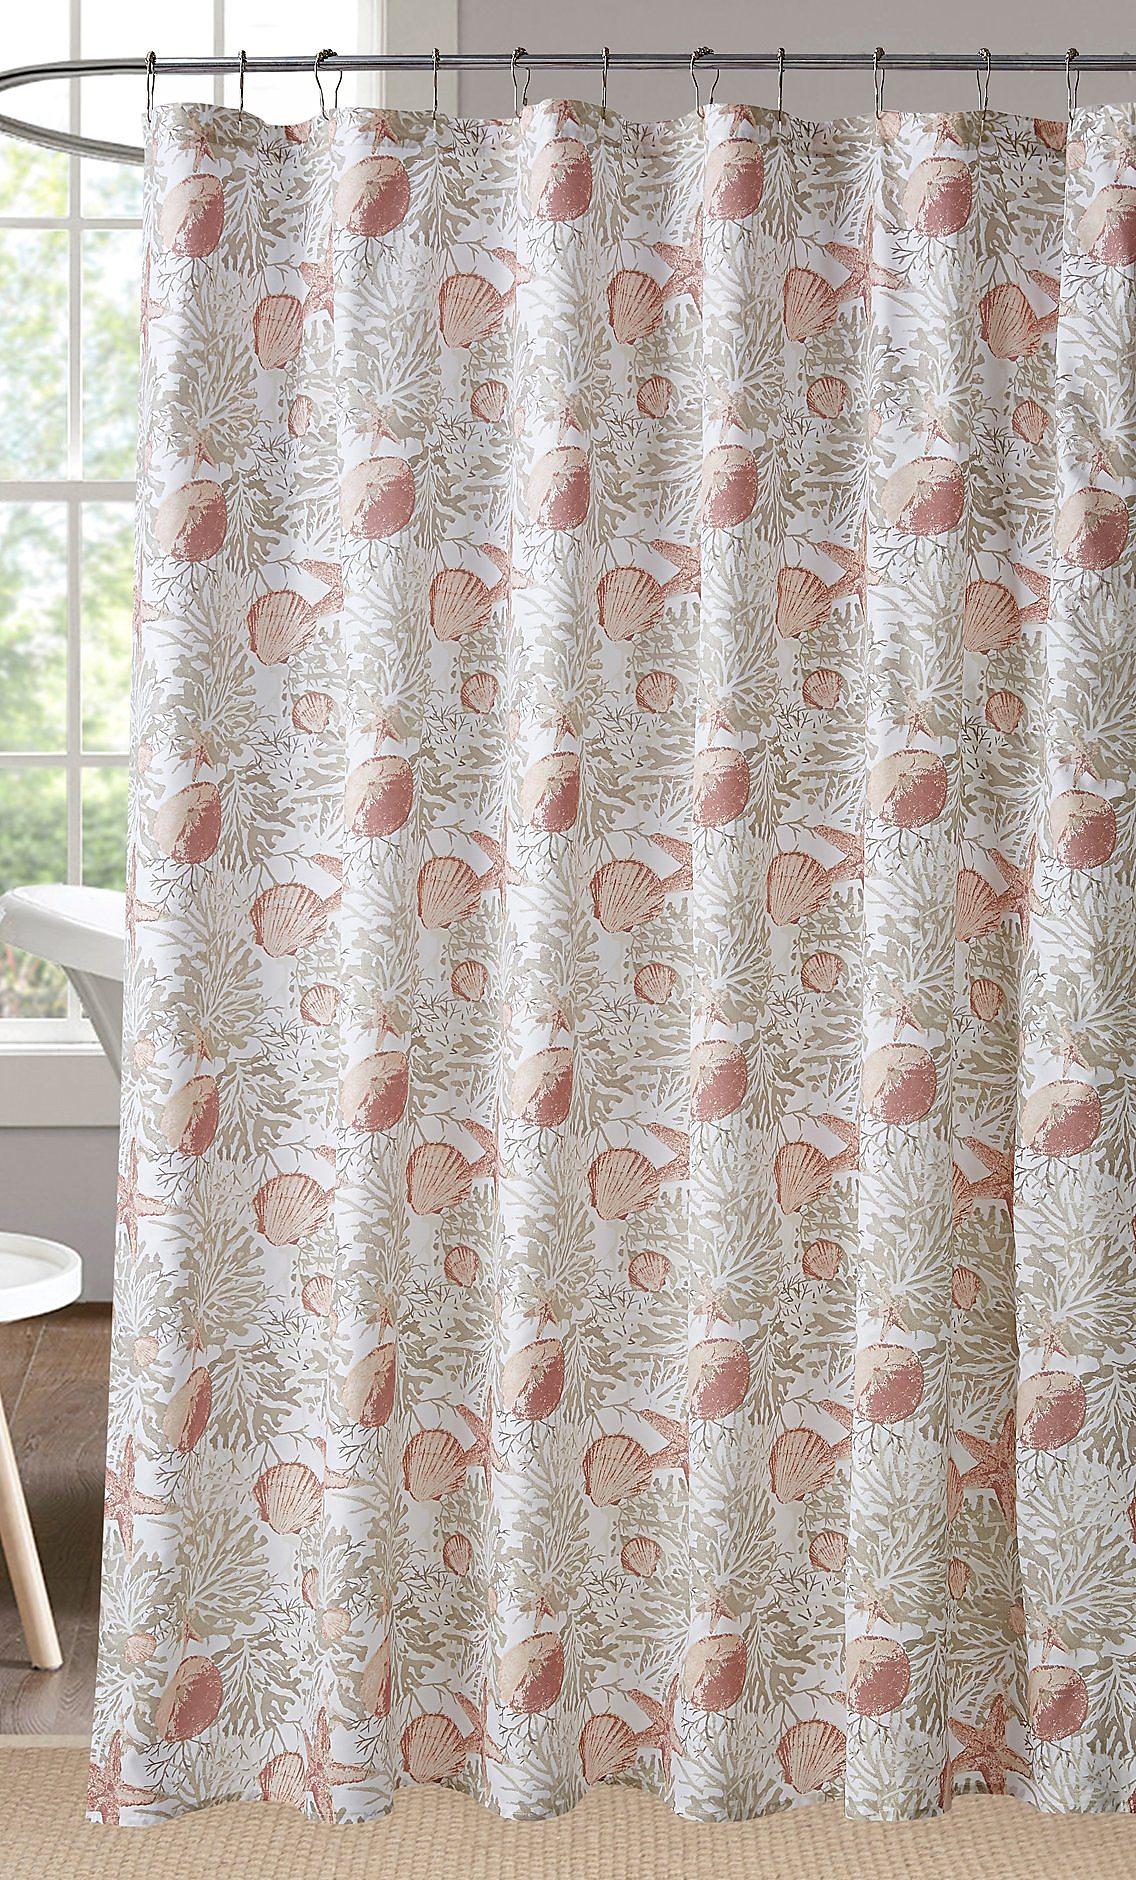 Coastal Home Caspian Sea Shower Curtain One Size Beige Coral White